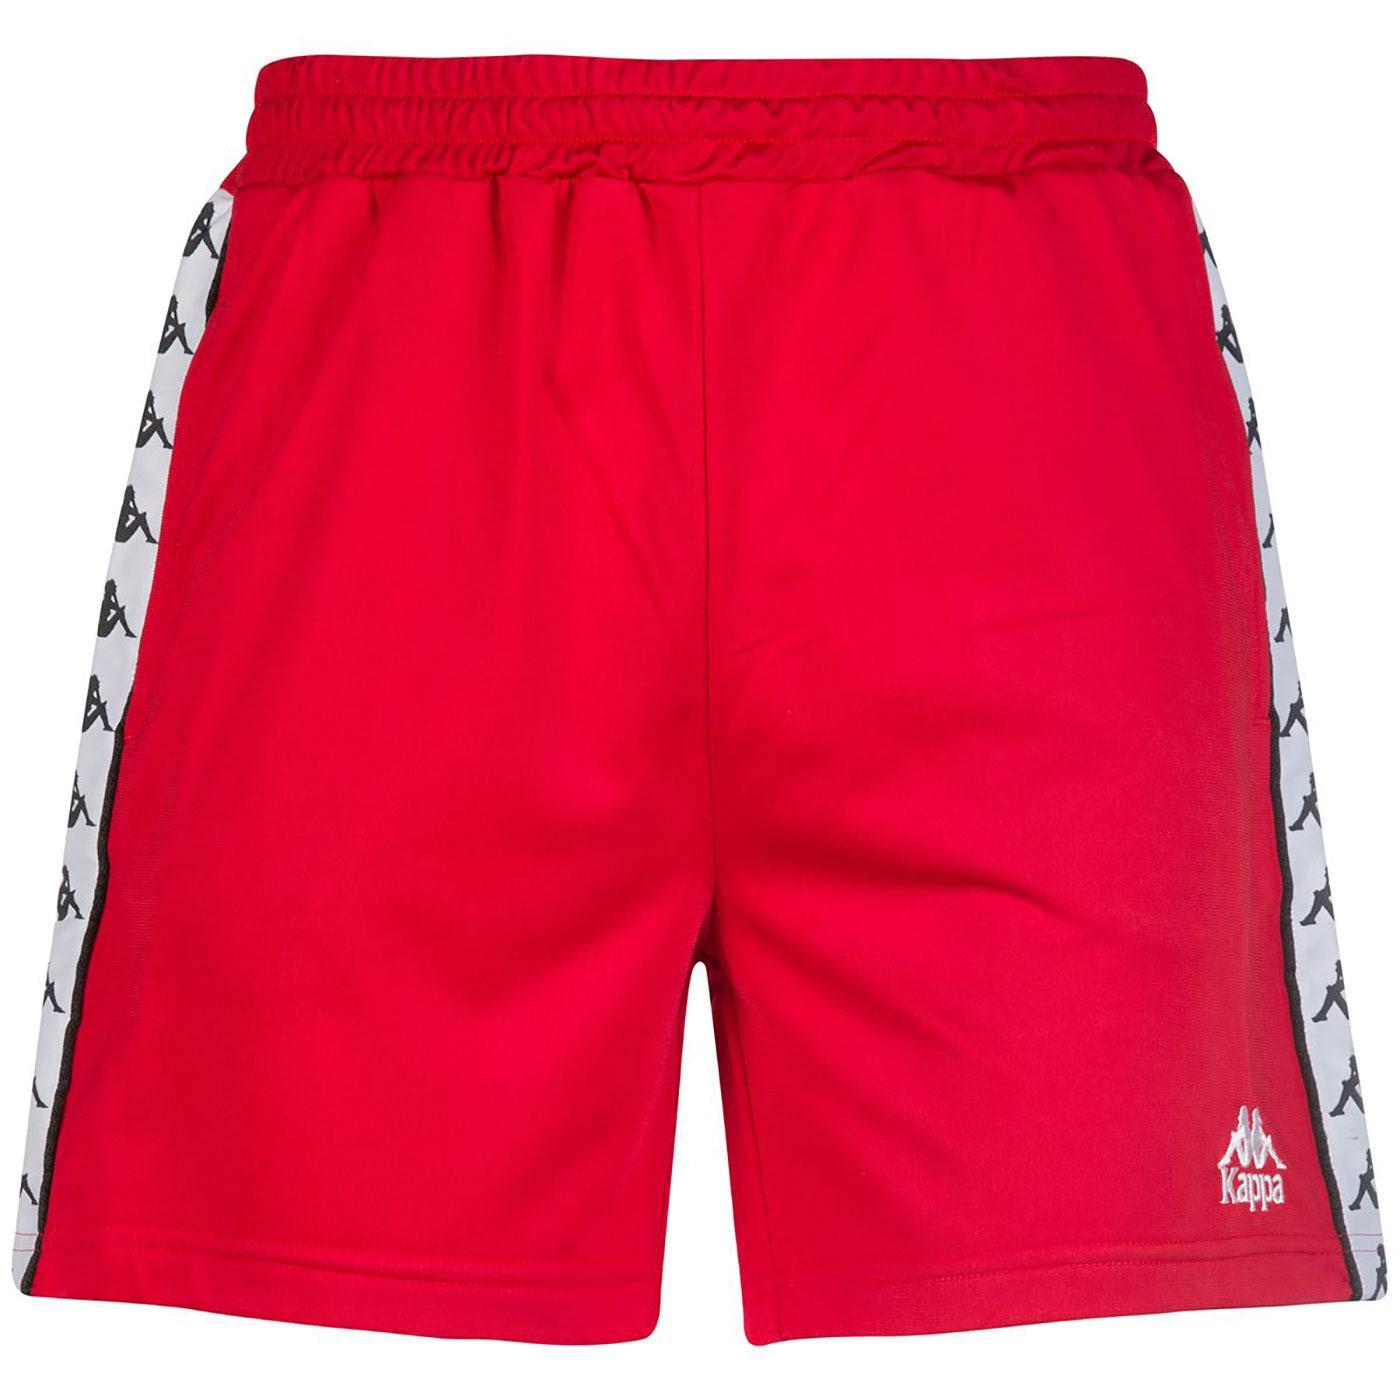 Cole KAPPA Men's Retro Seventies Football Shorts R